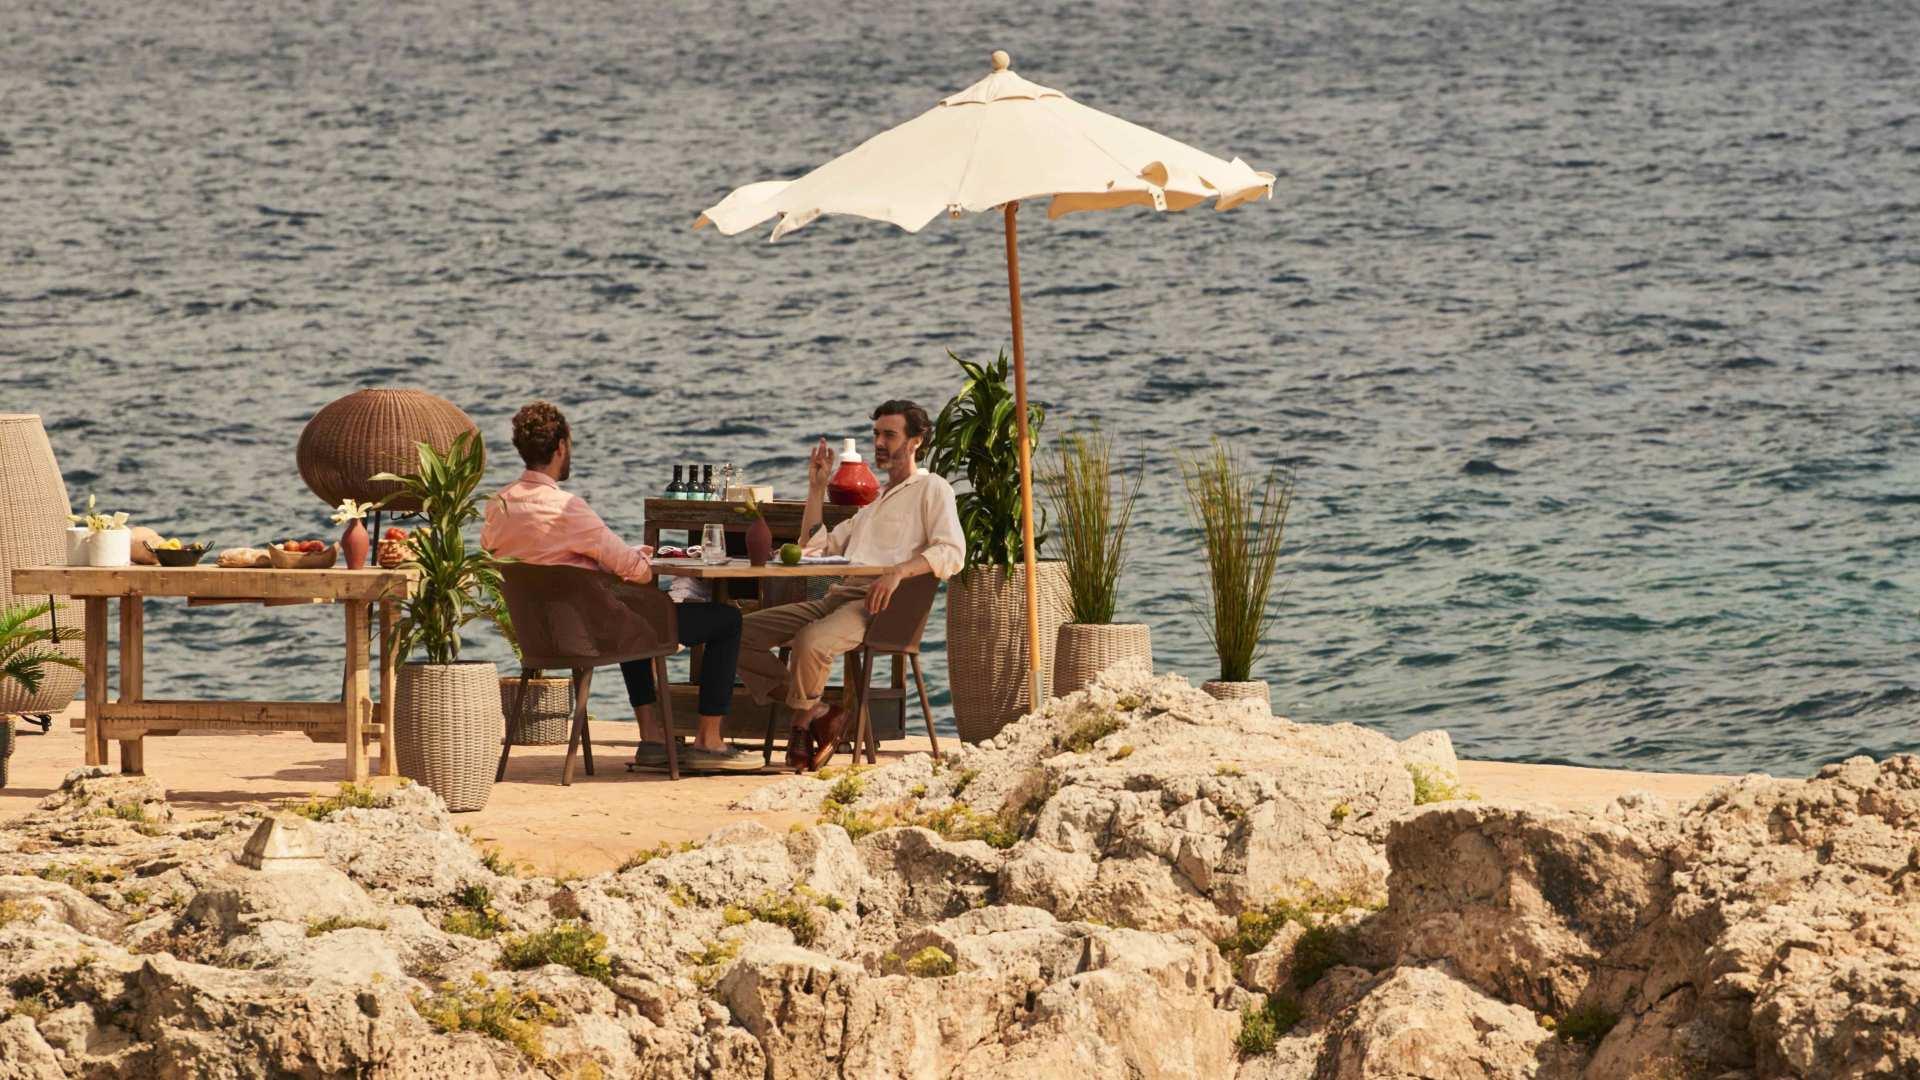 Ocho restaurantes donde tienes que reservar mesa esta Semana Santa